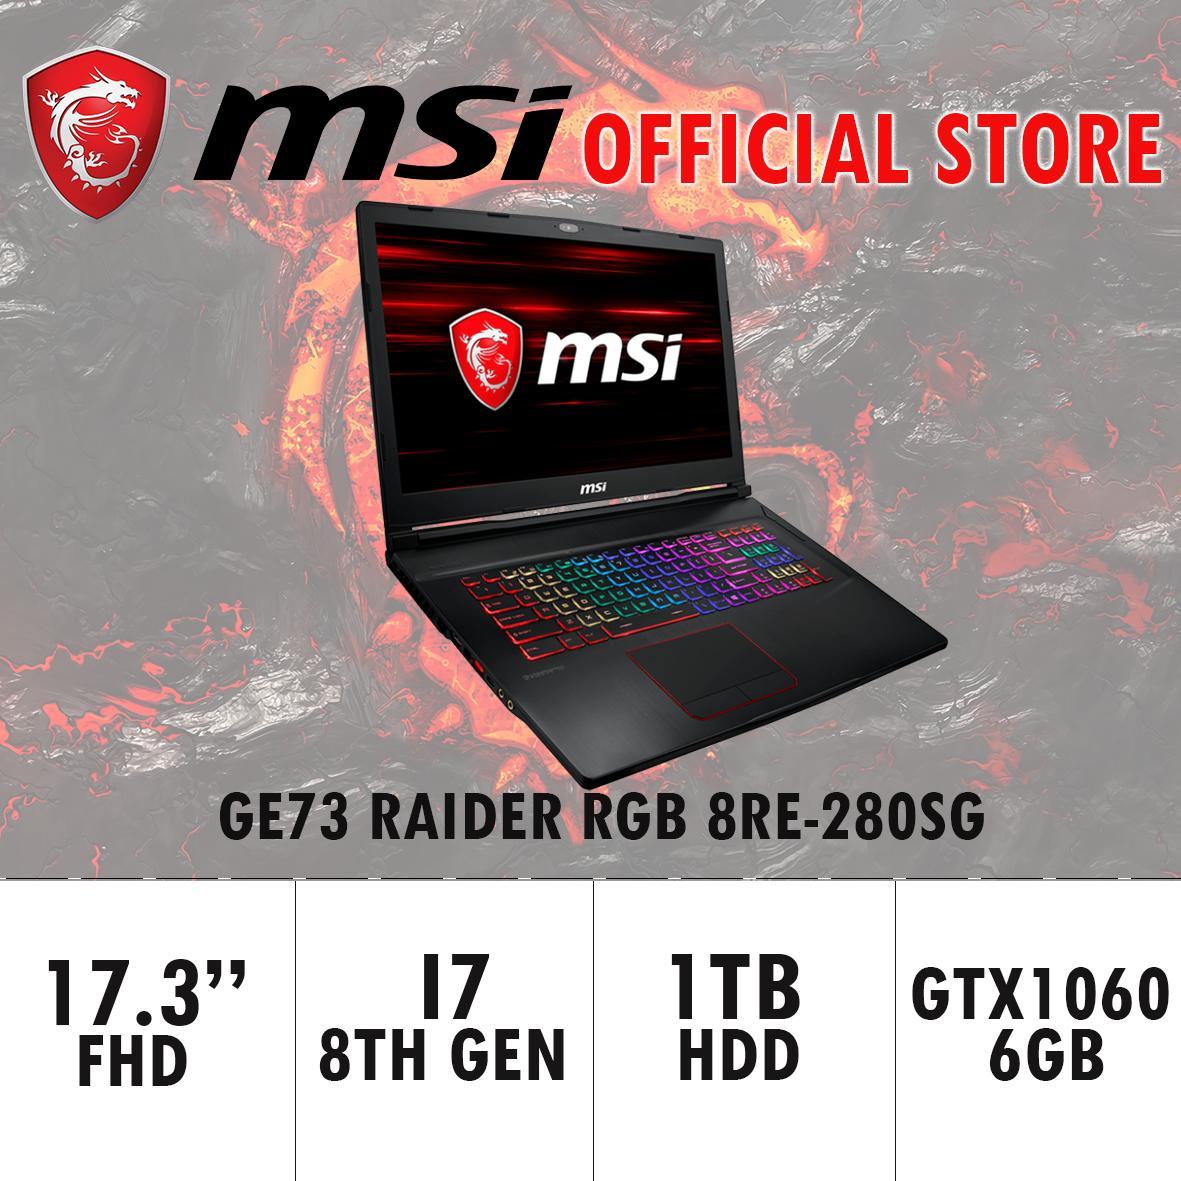 MSI GE73 Raider RGB 8RE-280SG (I7-8750H/16GB DDR4/256GB SSD+1TB HDD 7200RPM/6GB NVIDIA GTX1060) GAMING LAPTOP